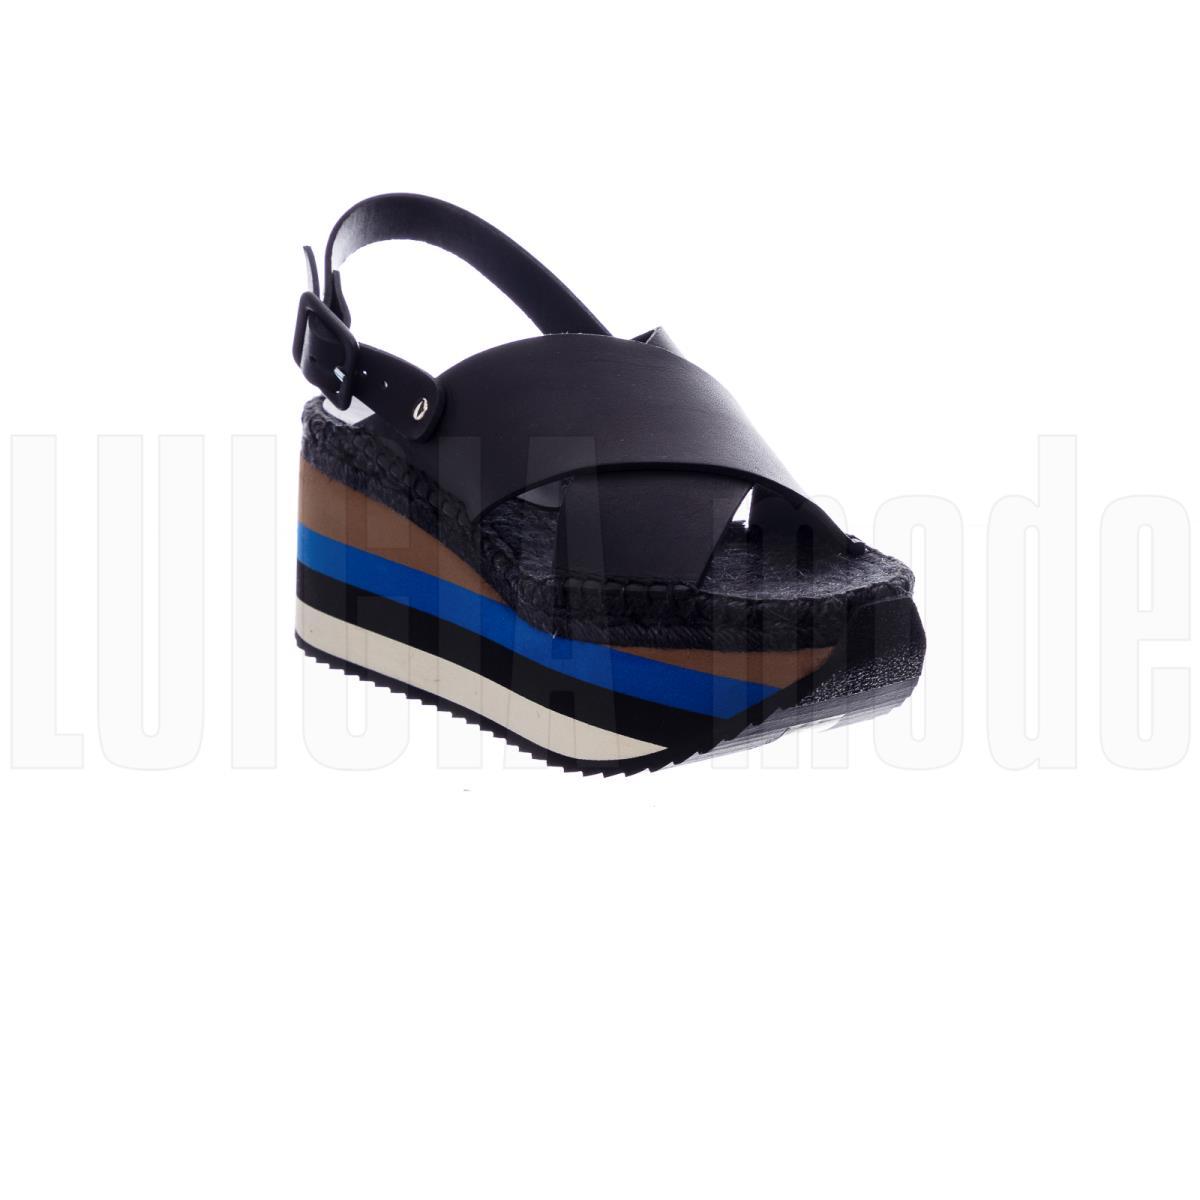 separation shoes c56f2 1ed06 Paloma BarcelÒ Sandalo